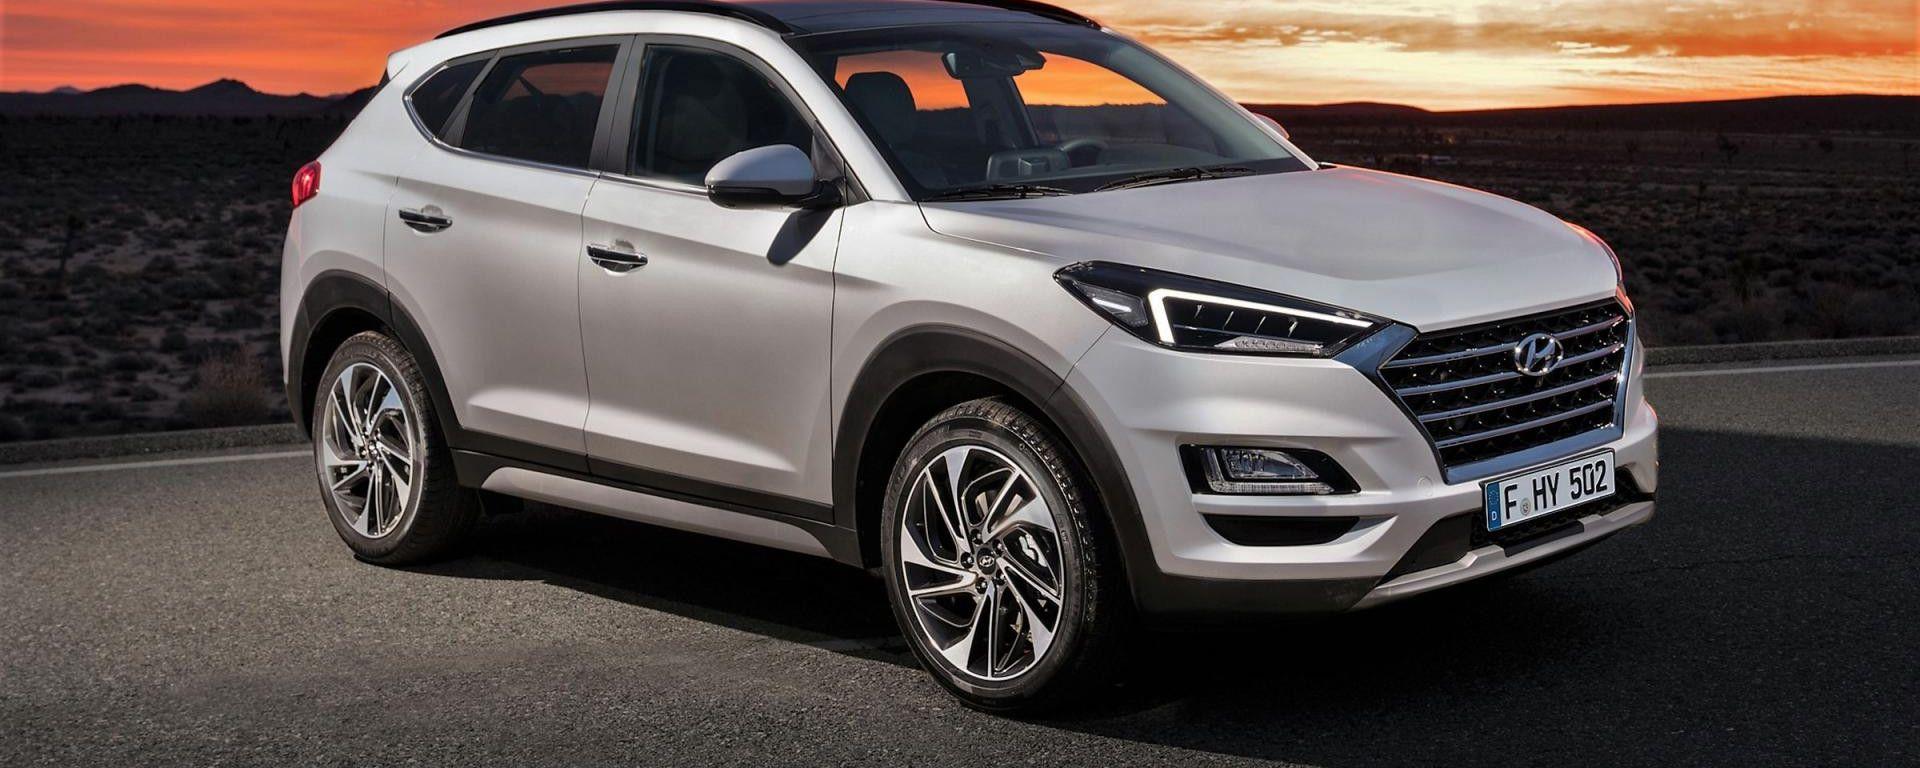 Hyundai Tucson, ora anche 1.6 CRDi Hybrid